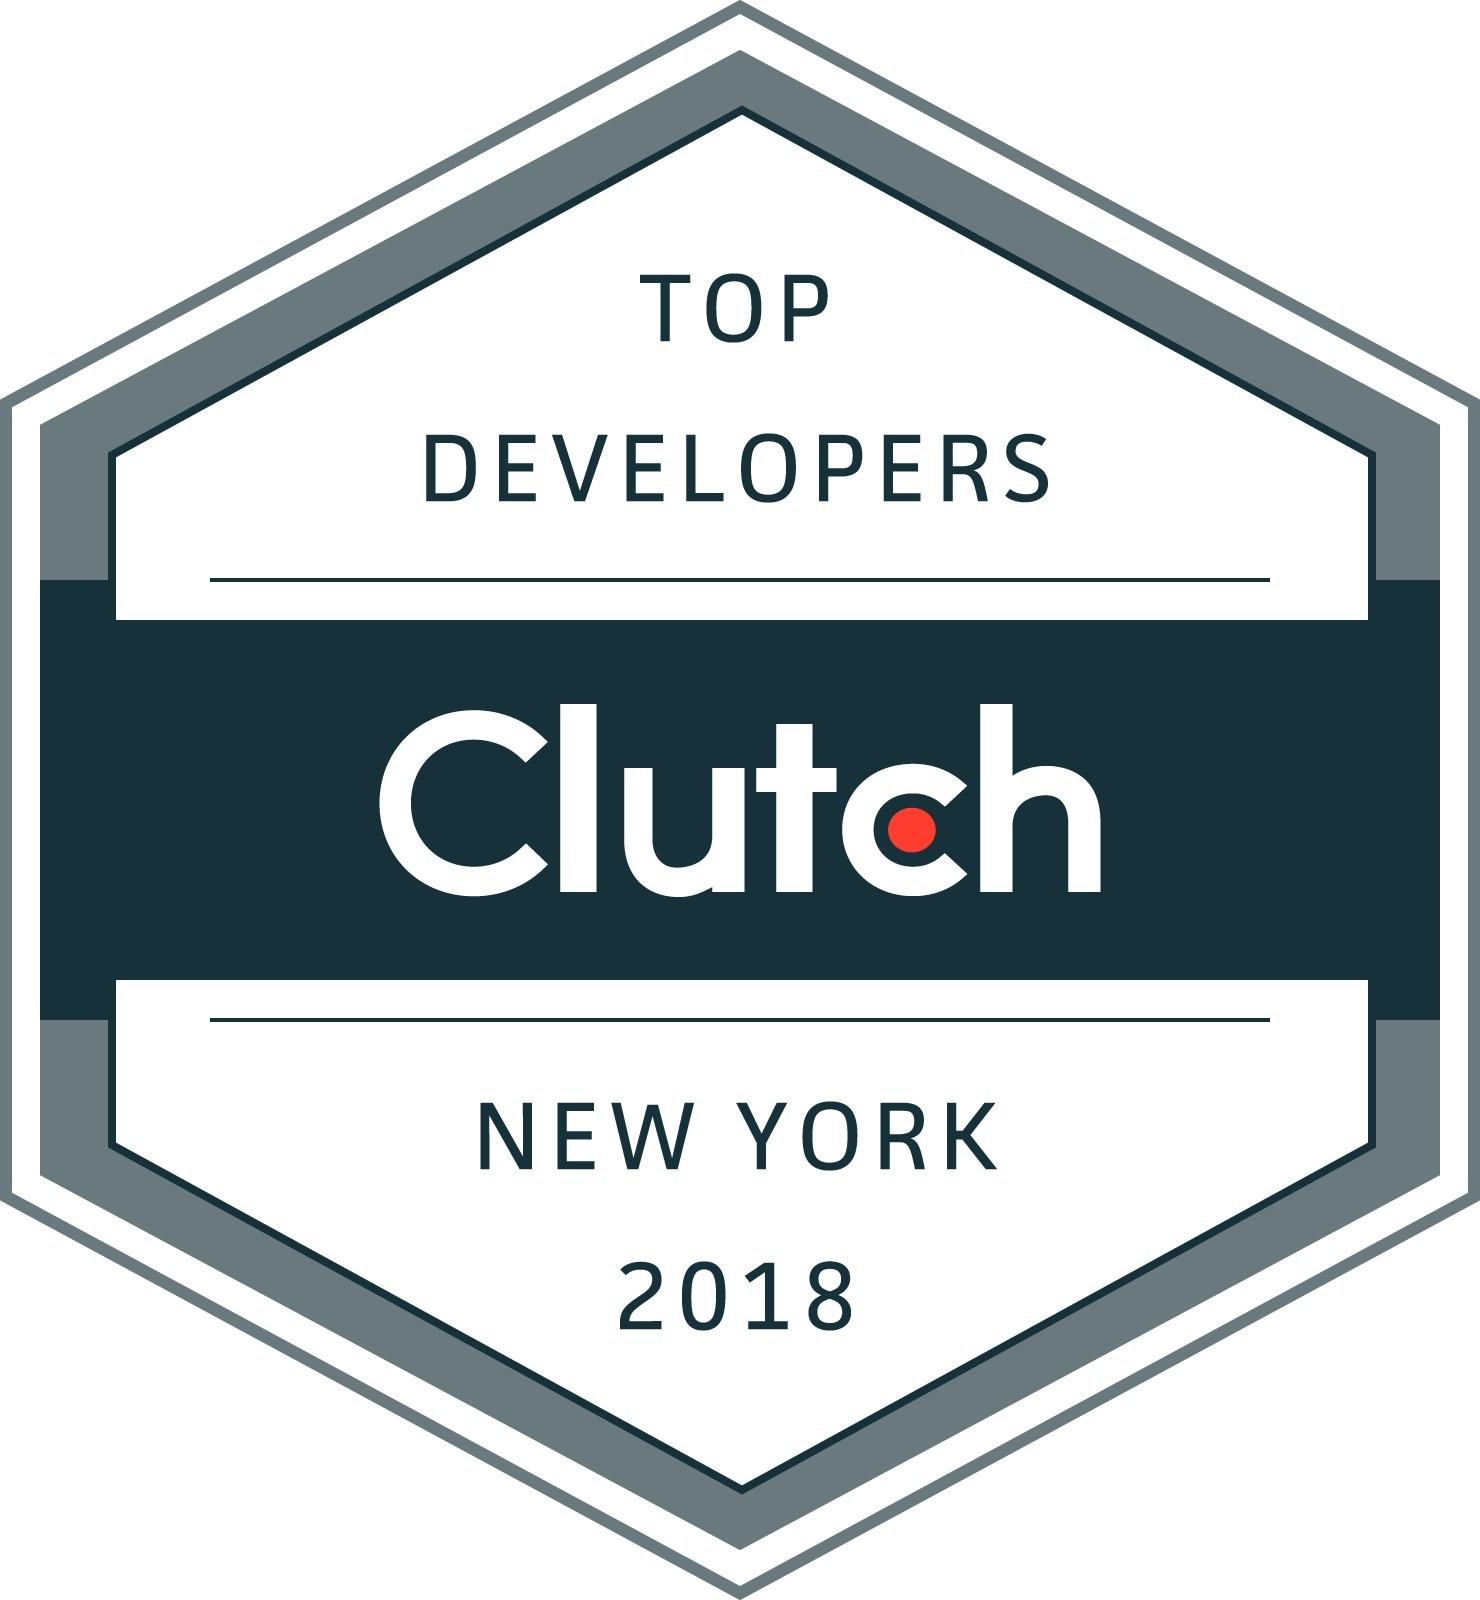 Top Developers in New York in 2018